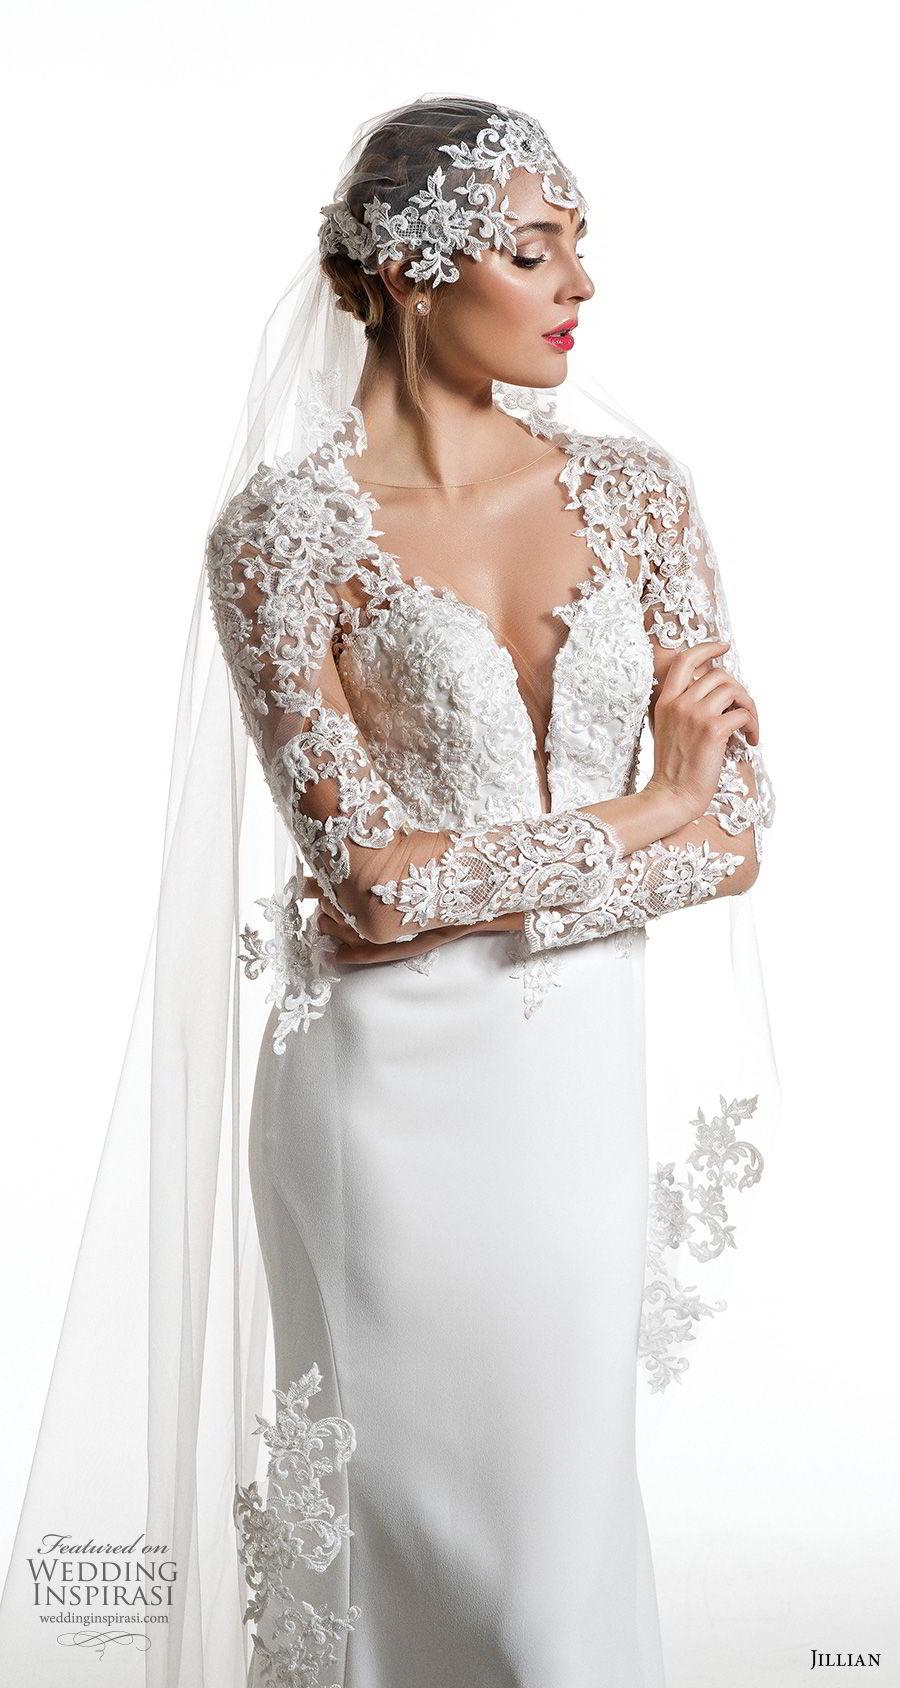 jillian 2019 bridal long sleeves deep plunging sweetheart neckline heavily embellished bodice elegant sheath wedding dress sheer button back short train (6) zv